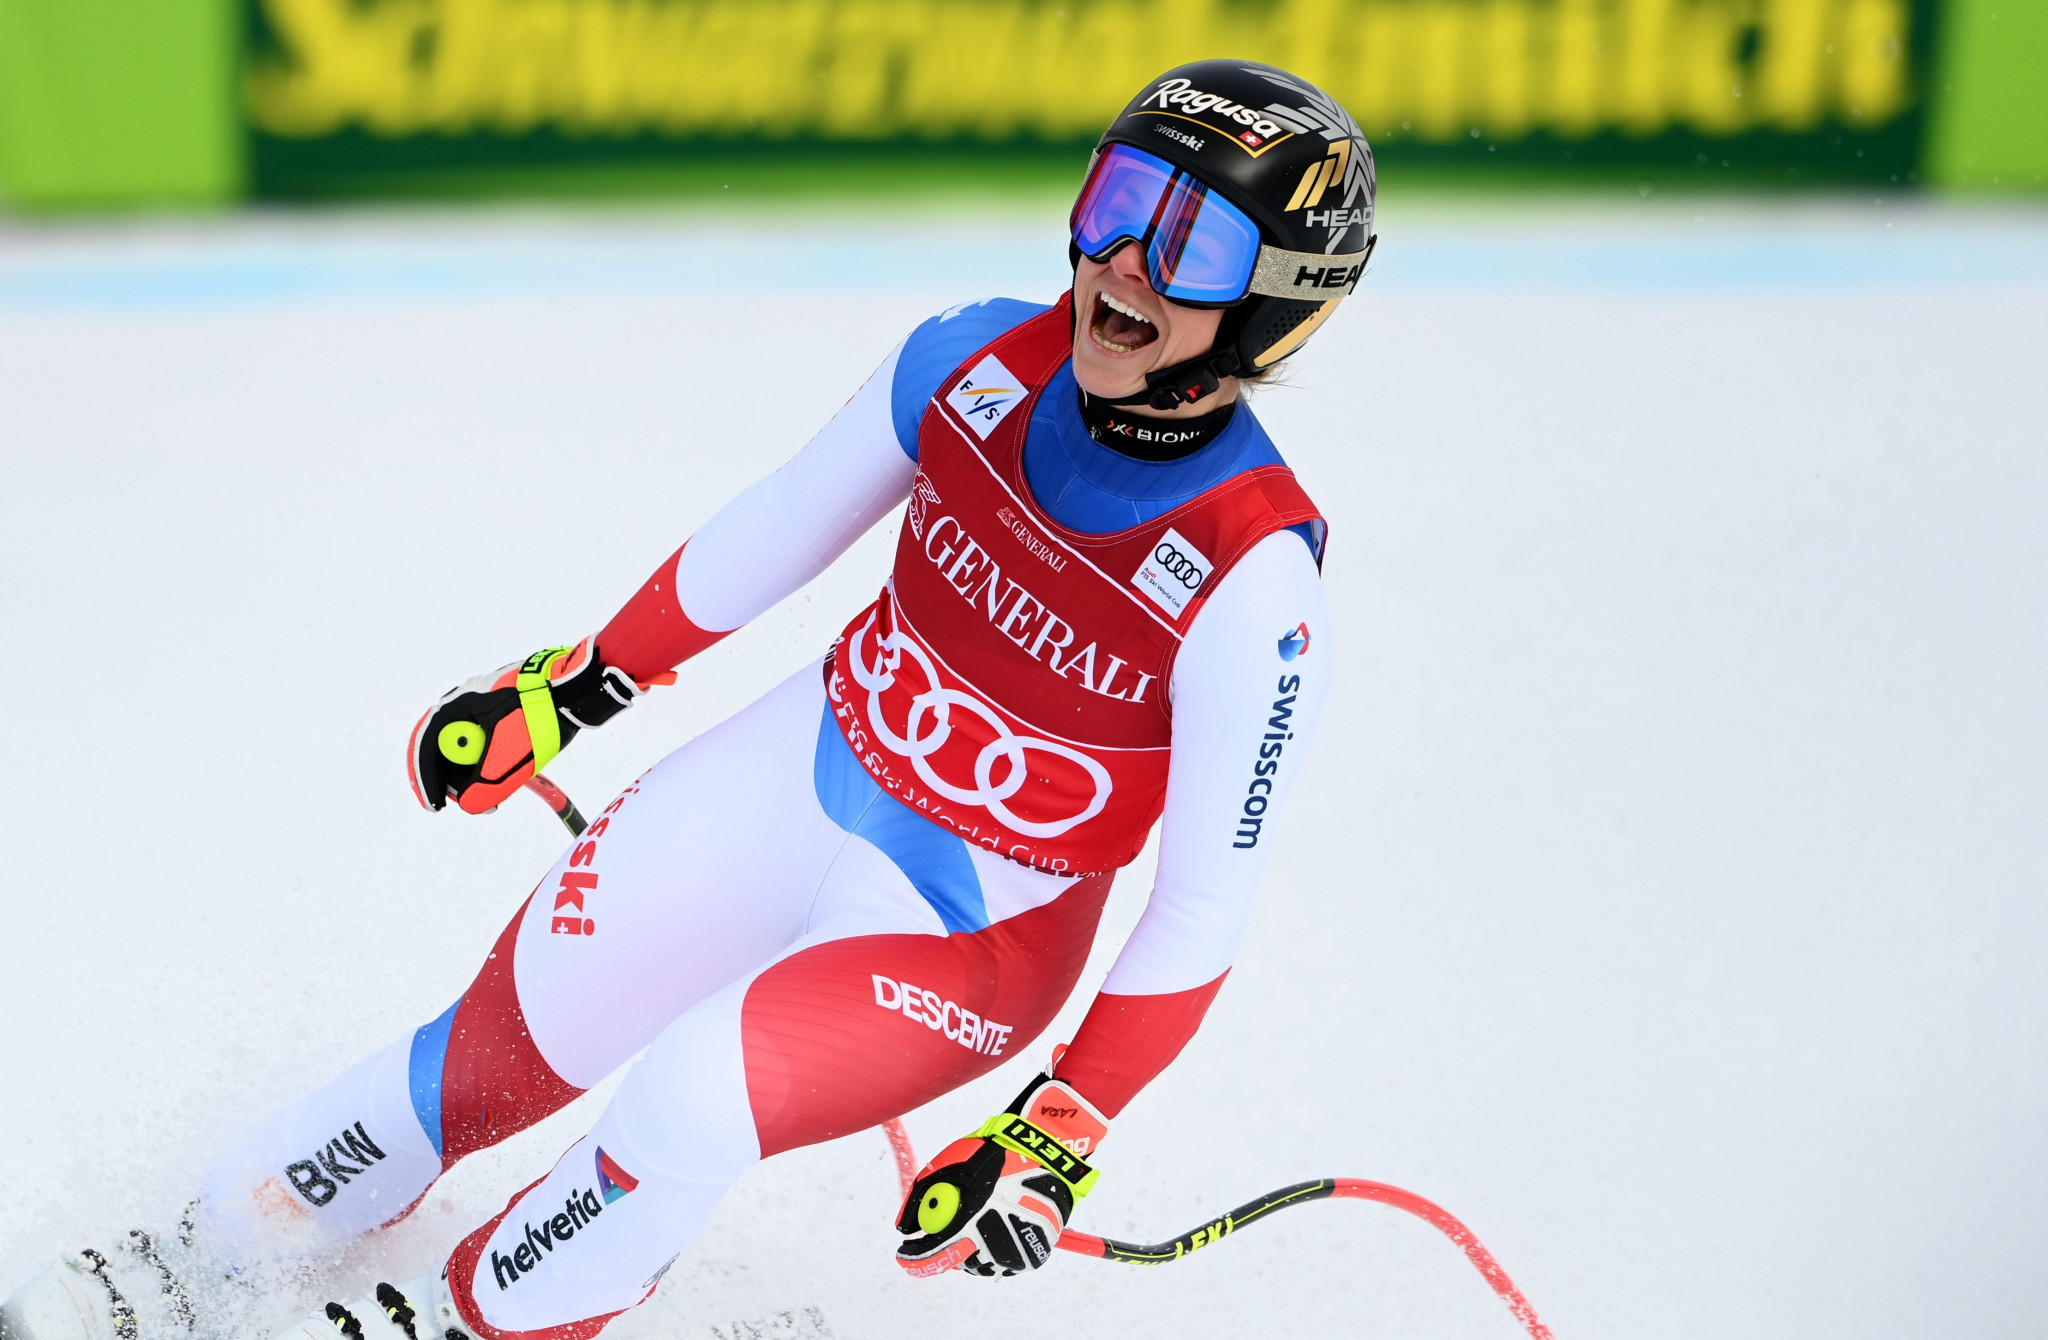 Gut-Behrami wins third consecutive super-G race at Alpine Skiing World Cup